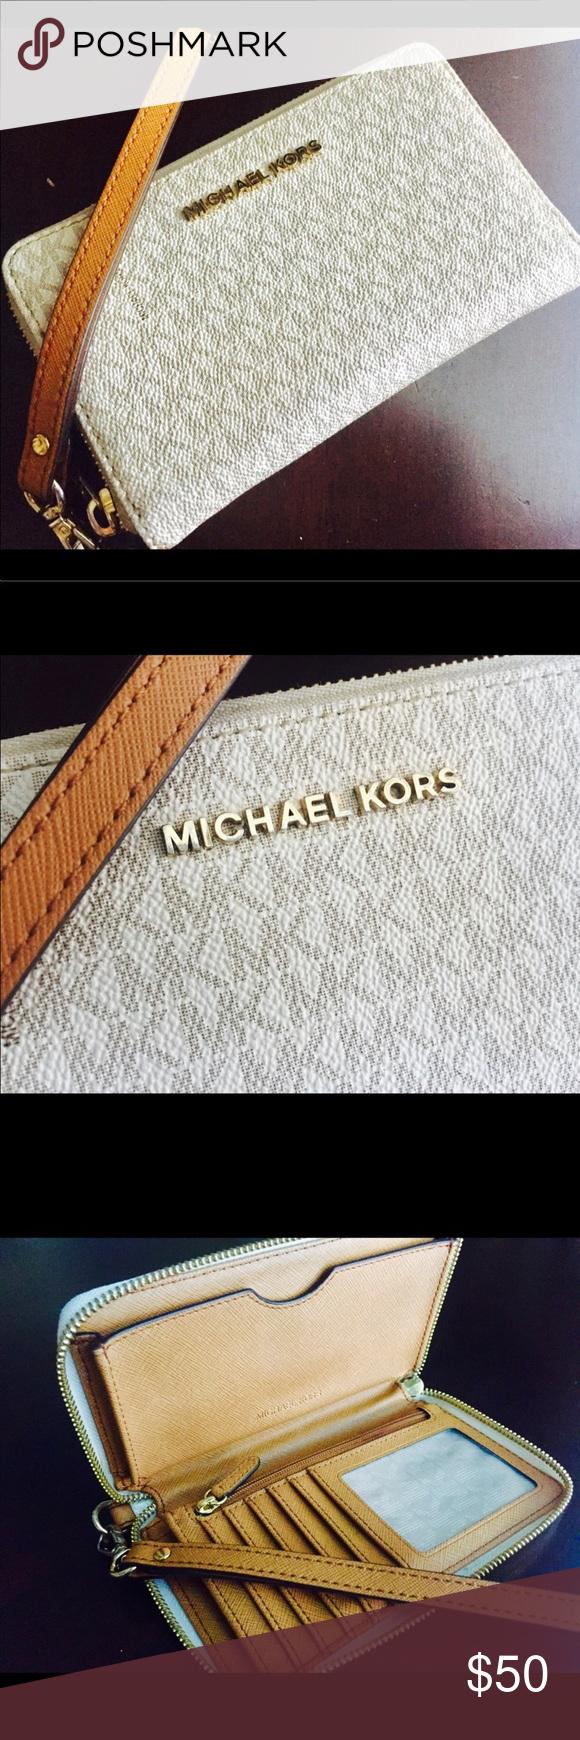 7b3373f01330 Michael Kors Logo Smartphone Wristlet This Michael Kors wristlet in white,  dine in the signature